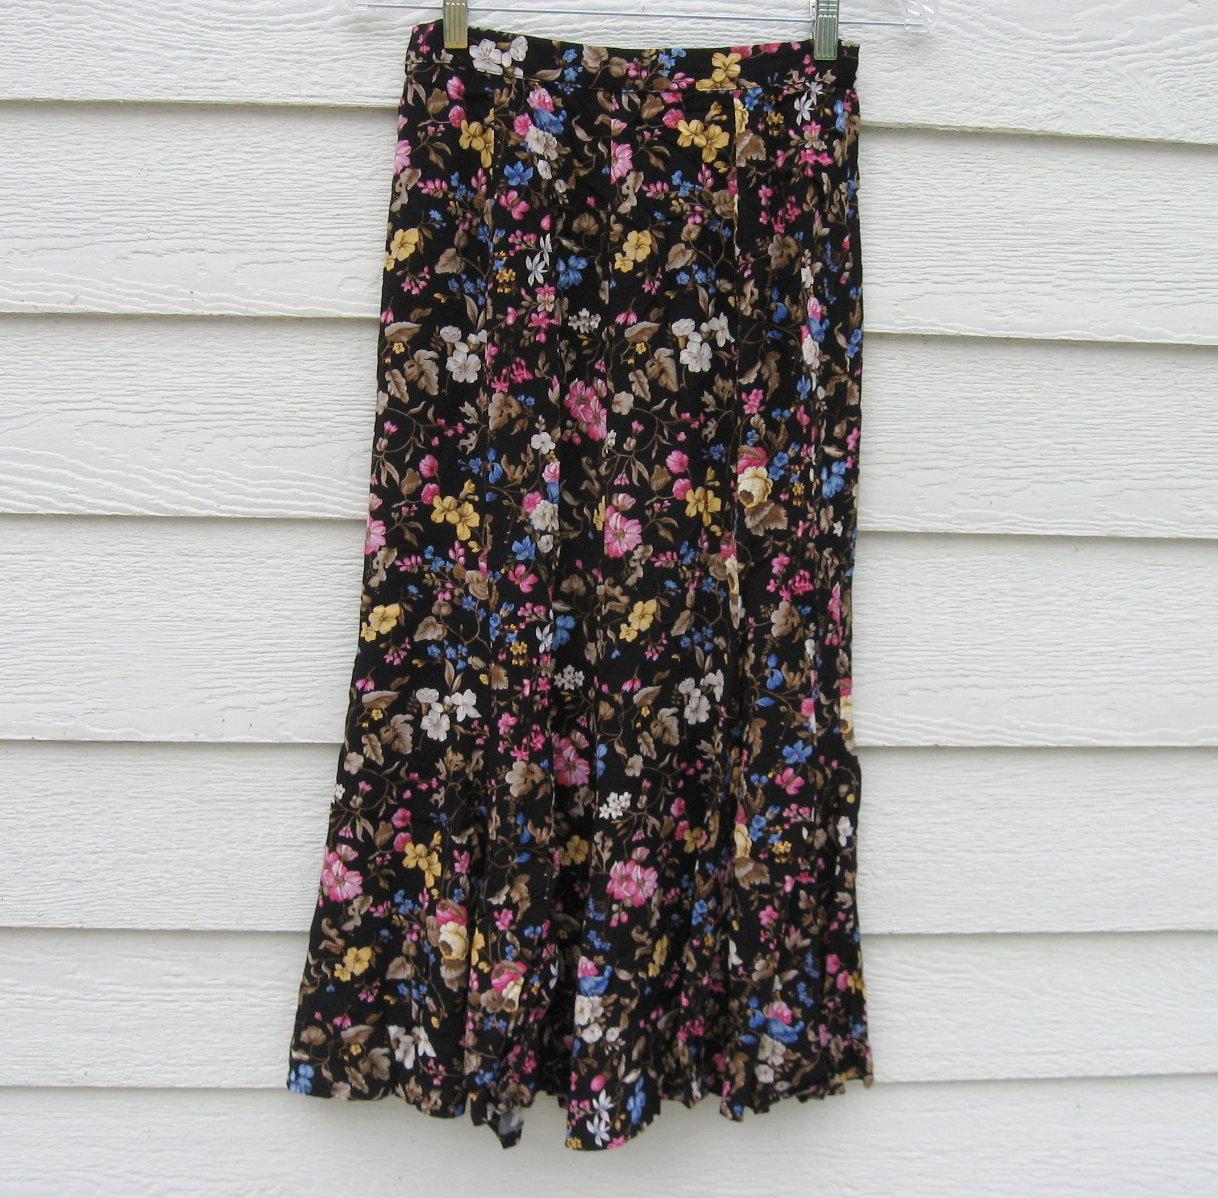 Liz Claiborne Skirt 26 Waist Black Floral Ankle Length